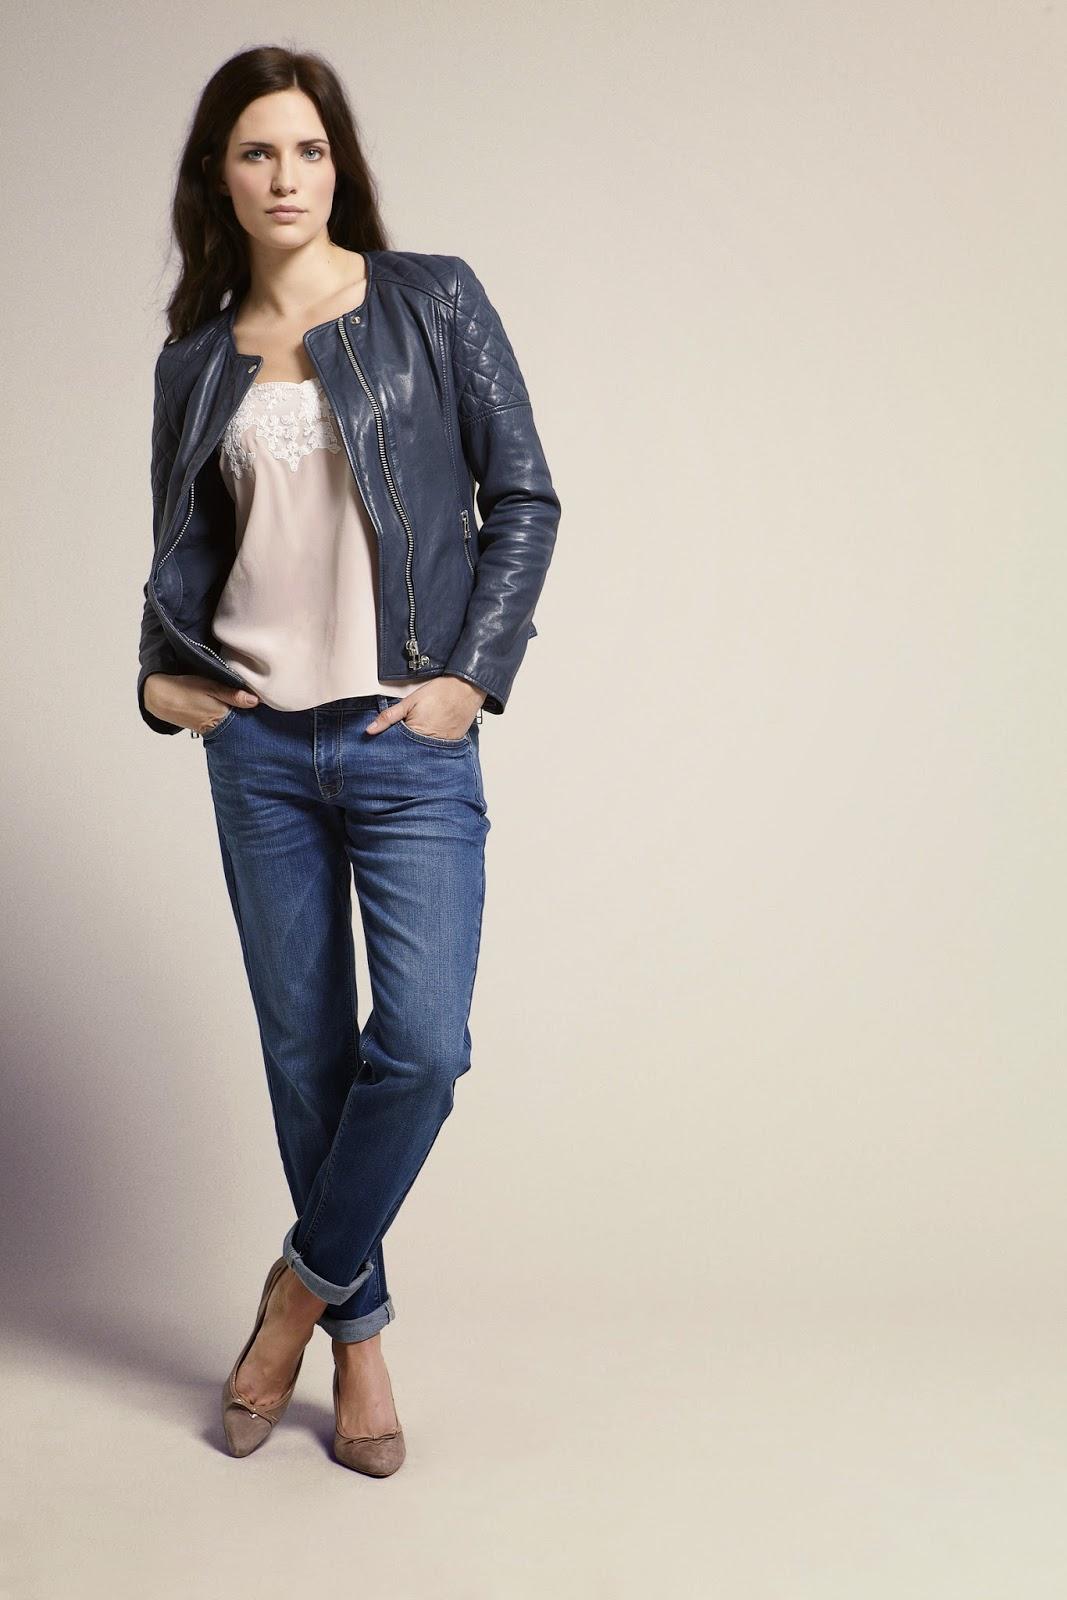 Leather jacket jigsaw - Gap